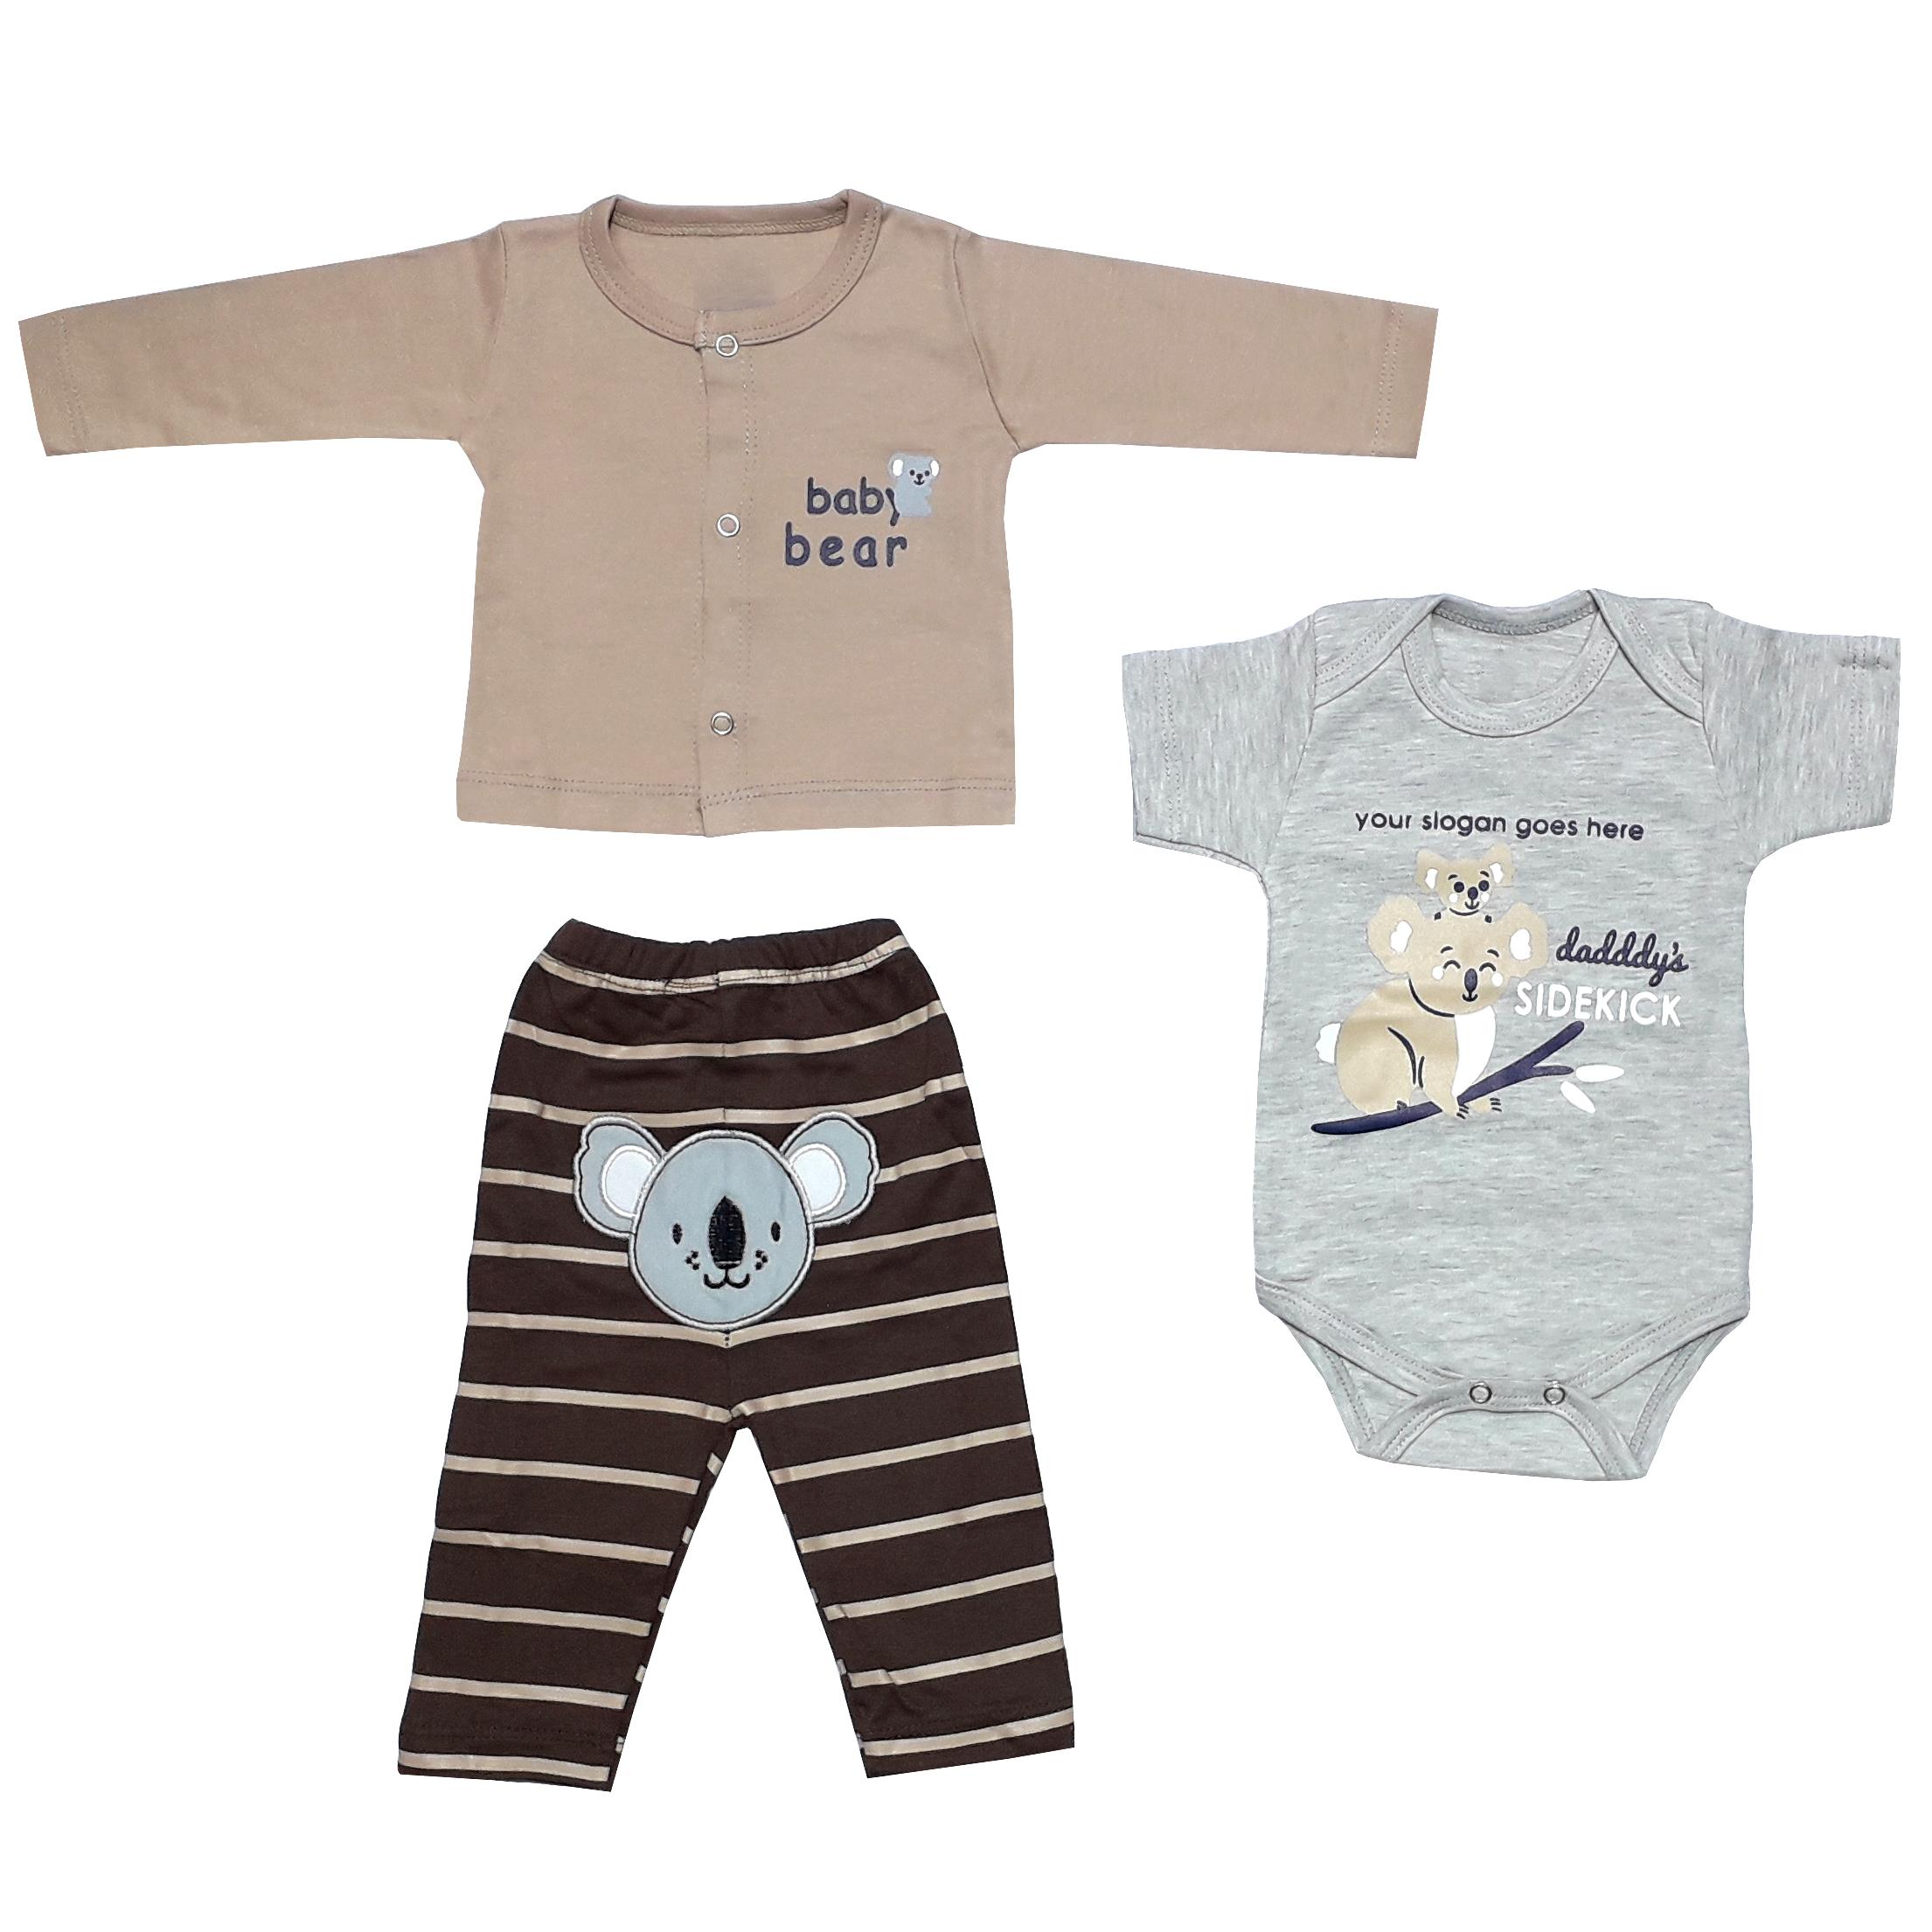 ست 3 تکه لباس نوزادی پسرانه طرح کوالا کد 1101